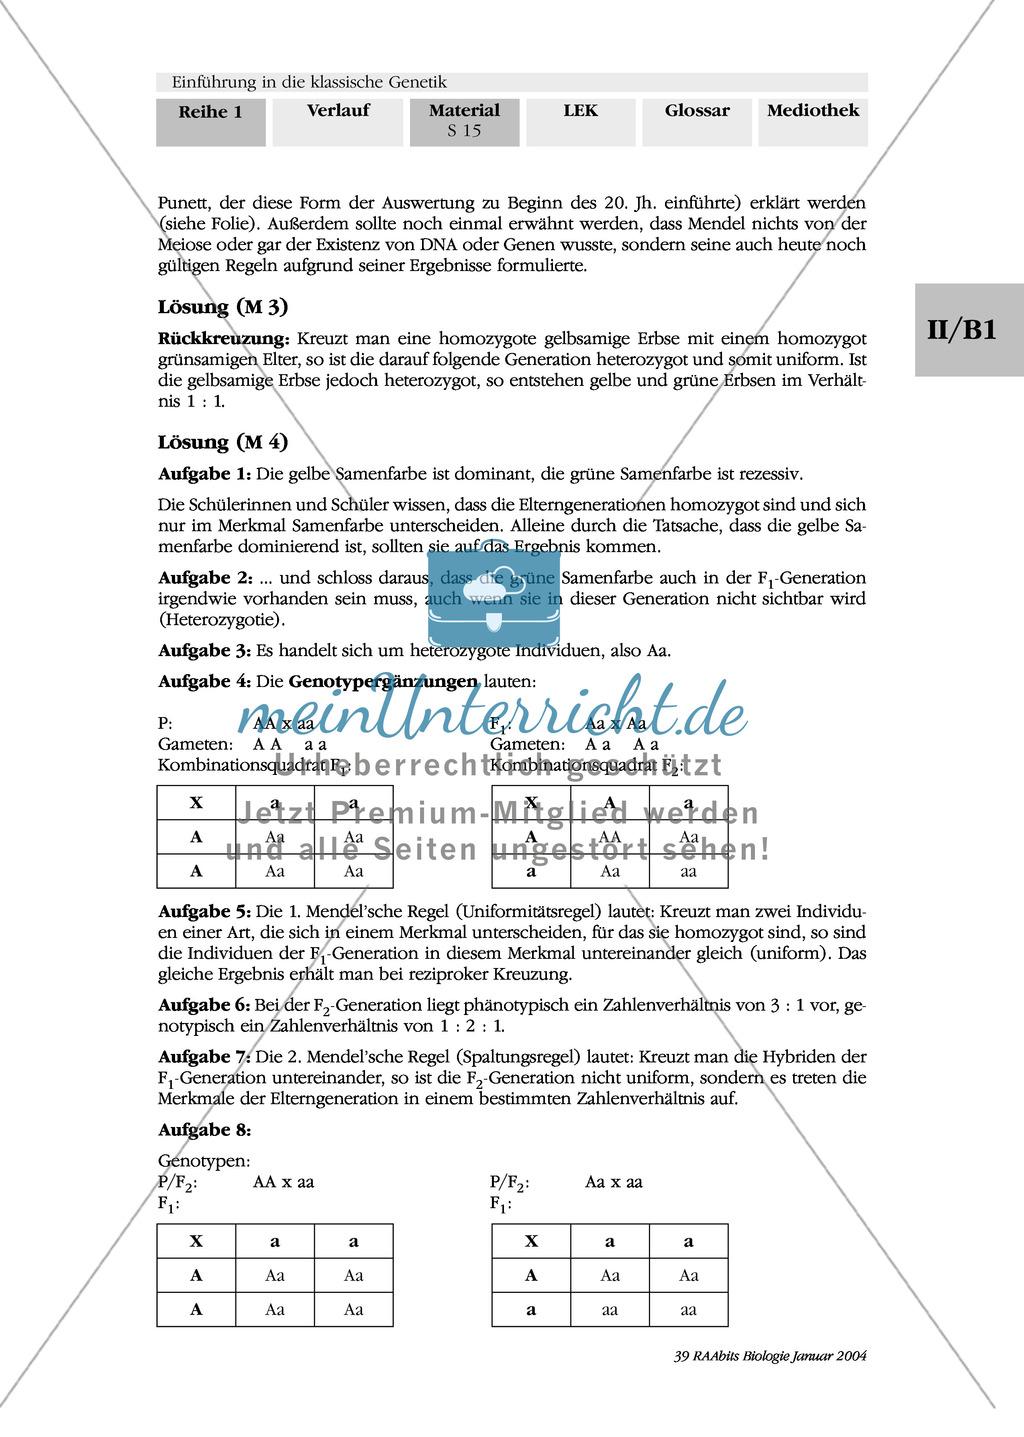 Klassische Genetik: Mendel`sche Regeln - Begriffe, Regeln, Kodominanz Preview 11